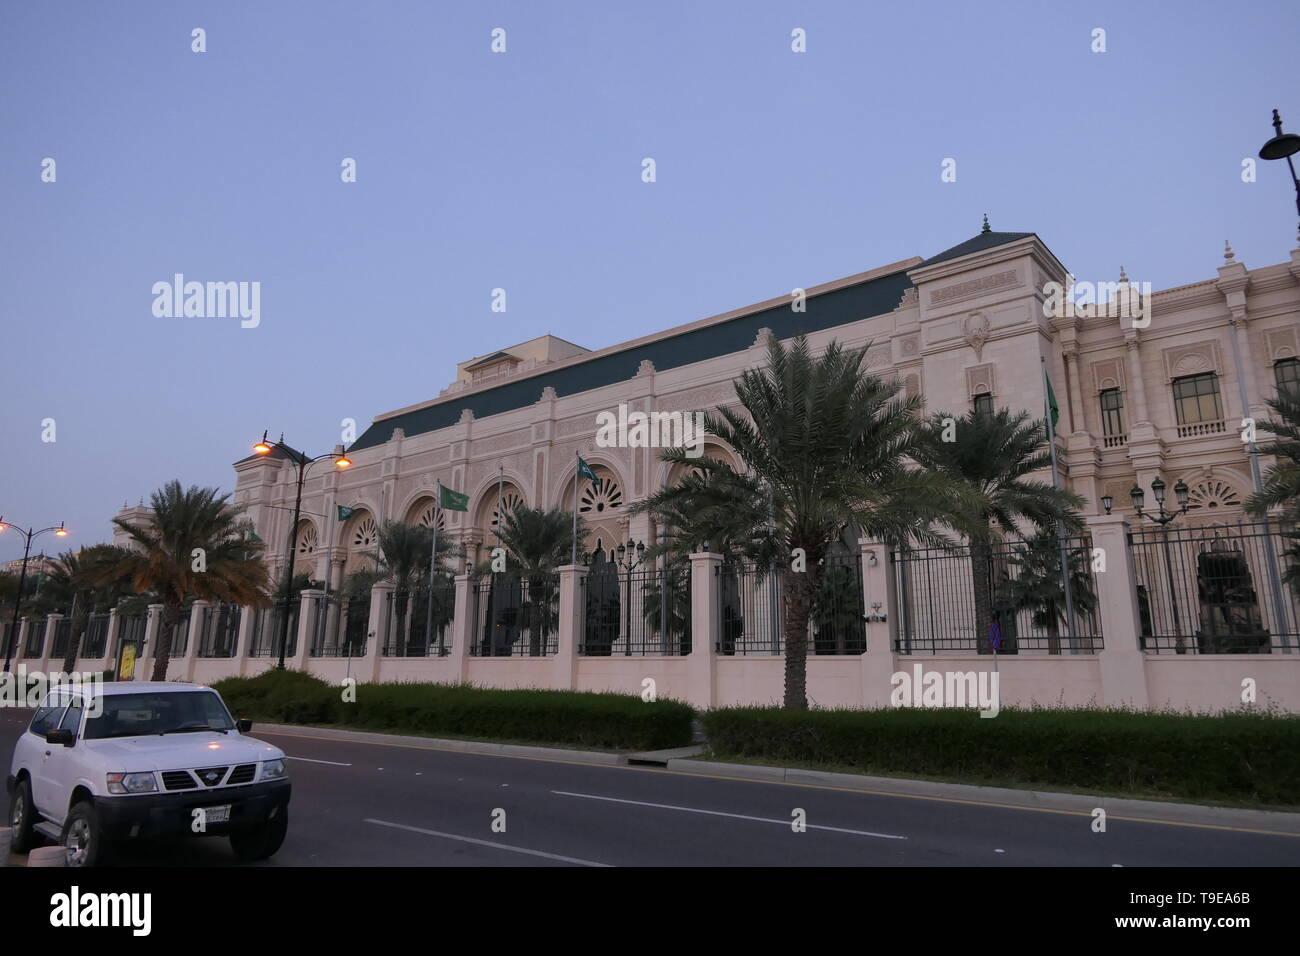 JEDDAH, SAUDI ARABIA - DECEMBER 20, 2018: Side view of the The Ritz-Carlton Hotel Jeddah - Stock Image